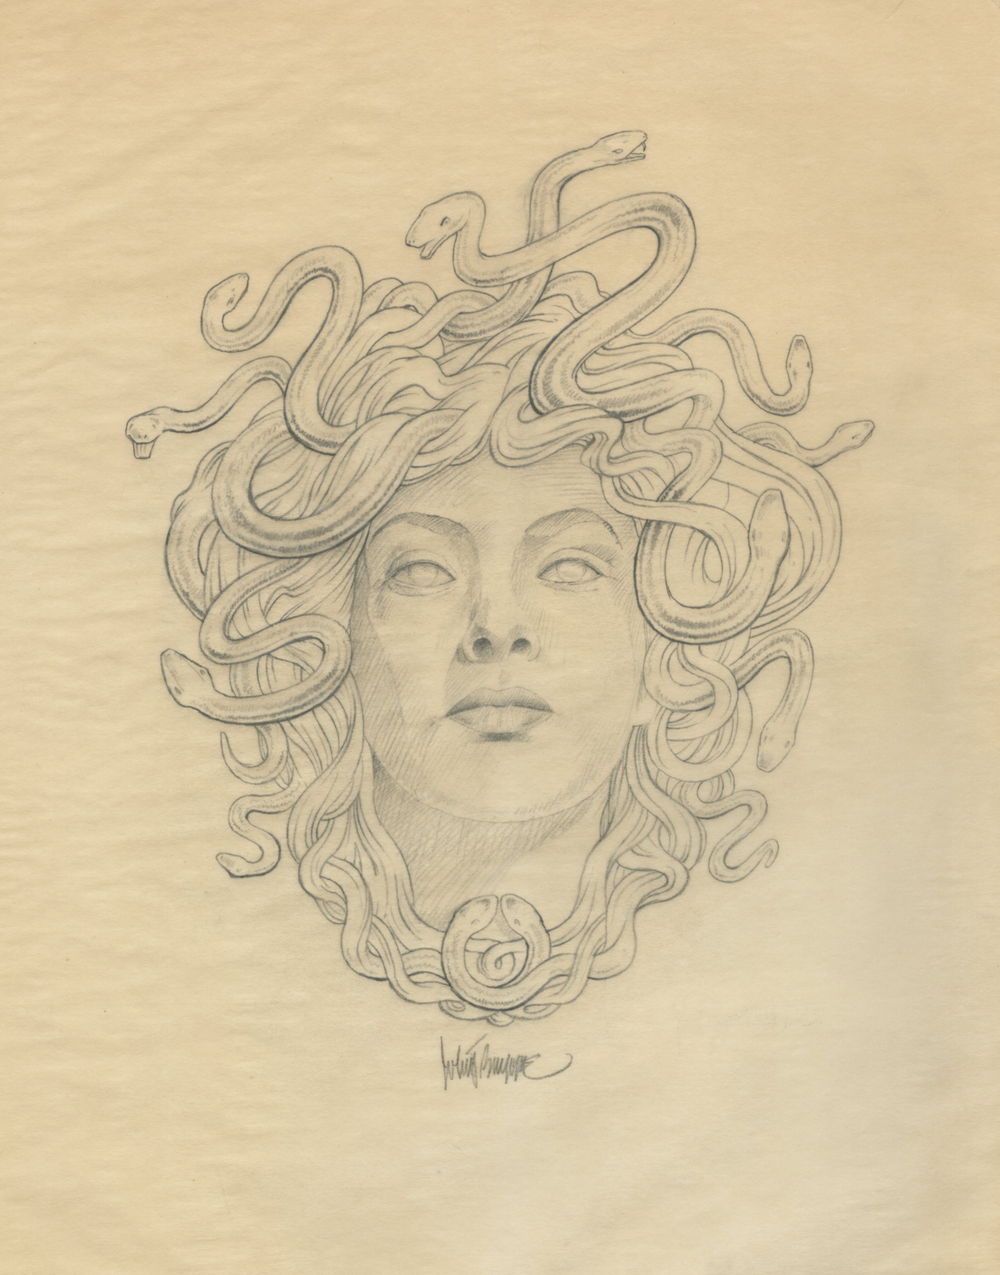 Medusa sketch030.jpg